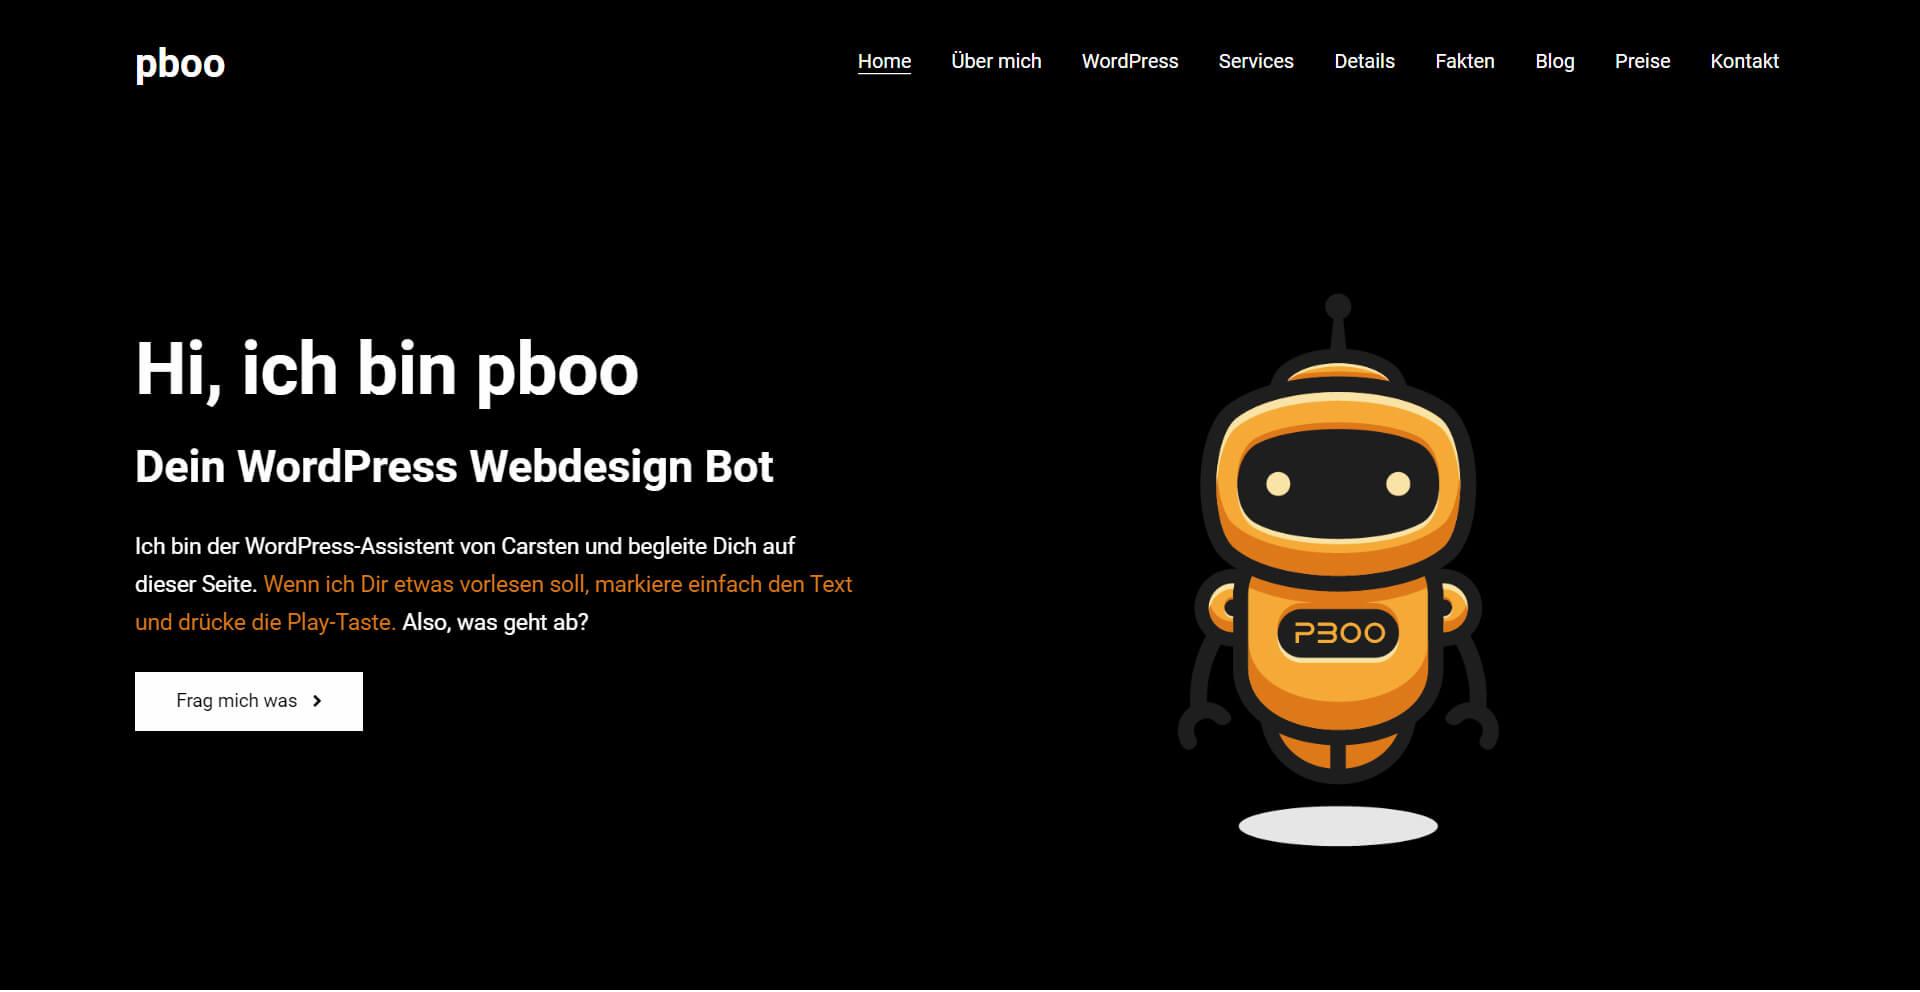 pBoo WordPress Webdesign Agentur